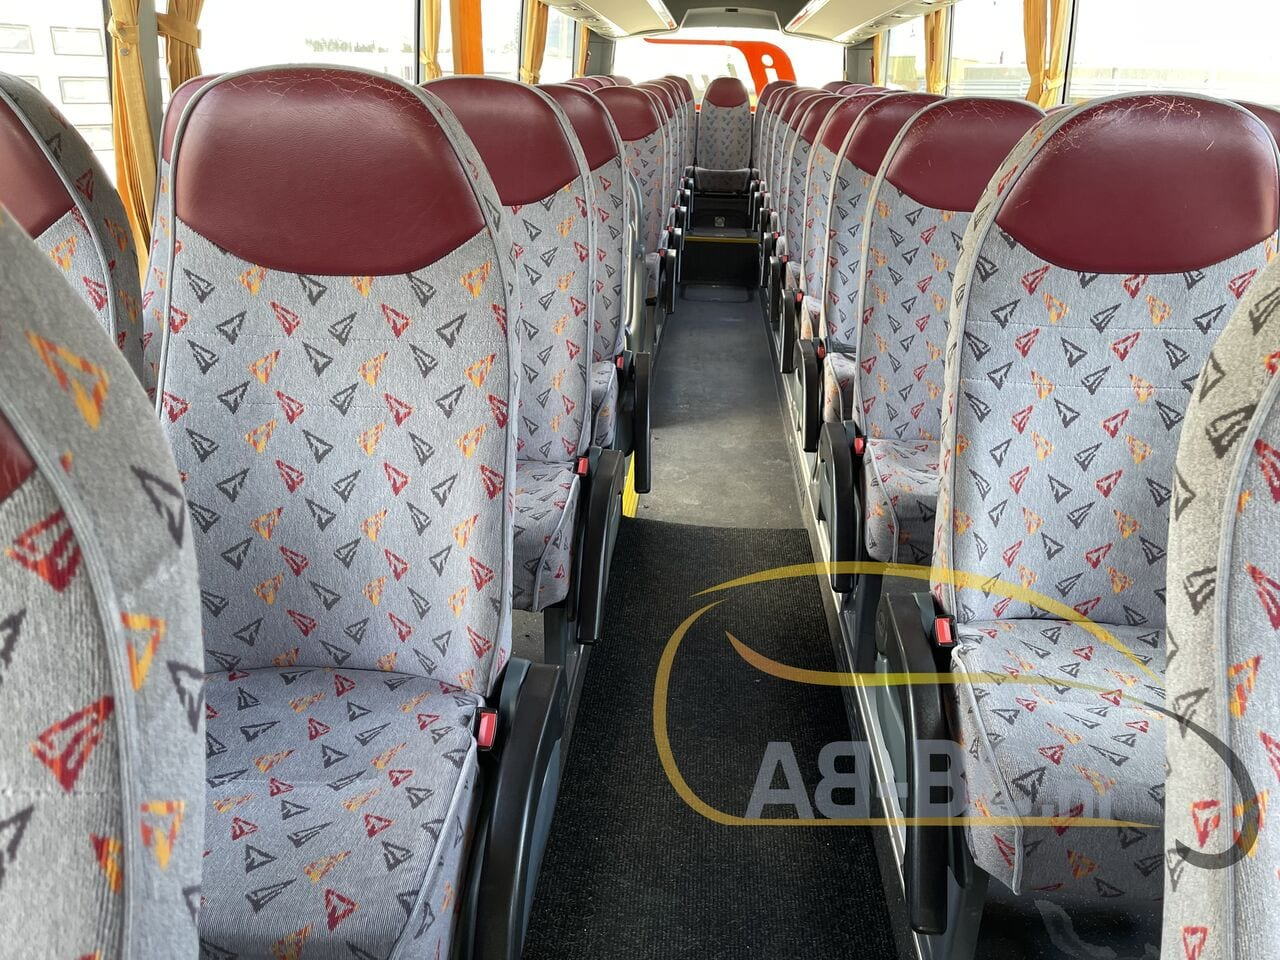 coach-busTEMSA-Safari-RD-53-Seats-DAF-Motor-12-mtr---1616166786247087089_big_970b14054452768021e6466b7a3e681e--21031917053743807500